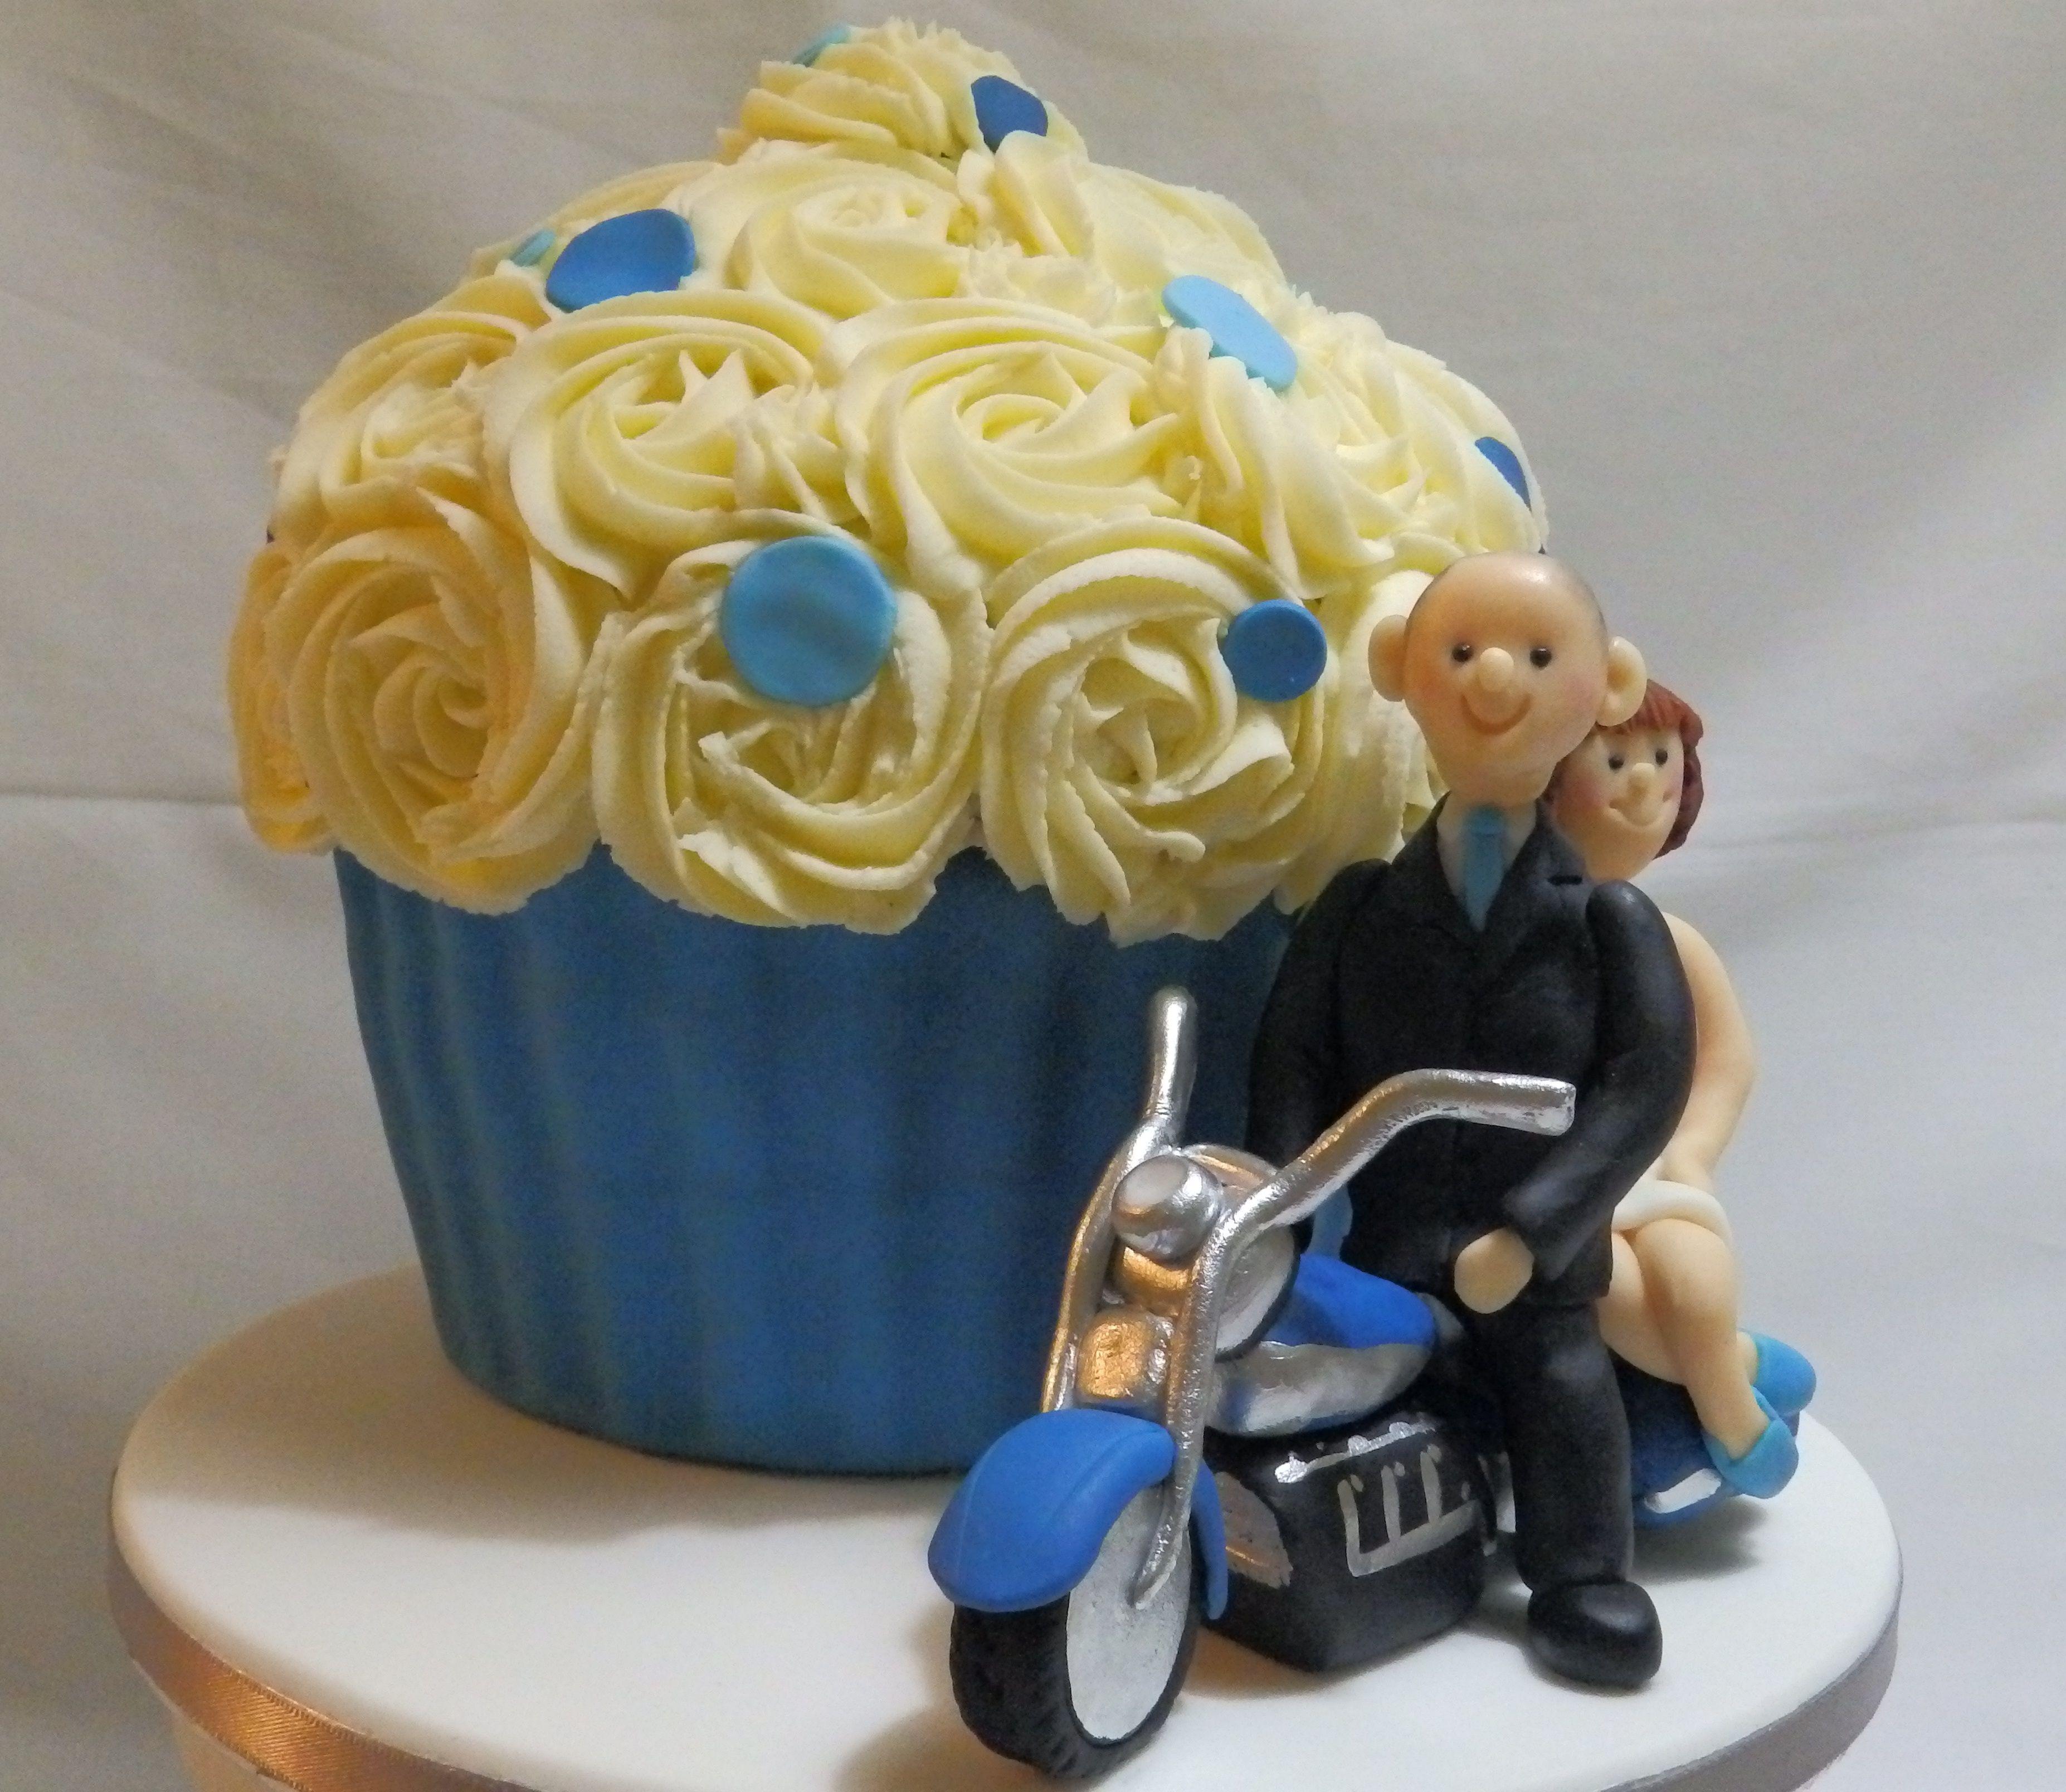 giant cupcake wedding cake with bride and groom on motorbike ...